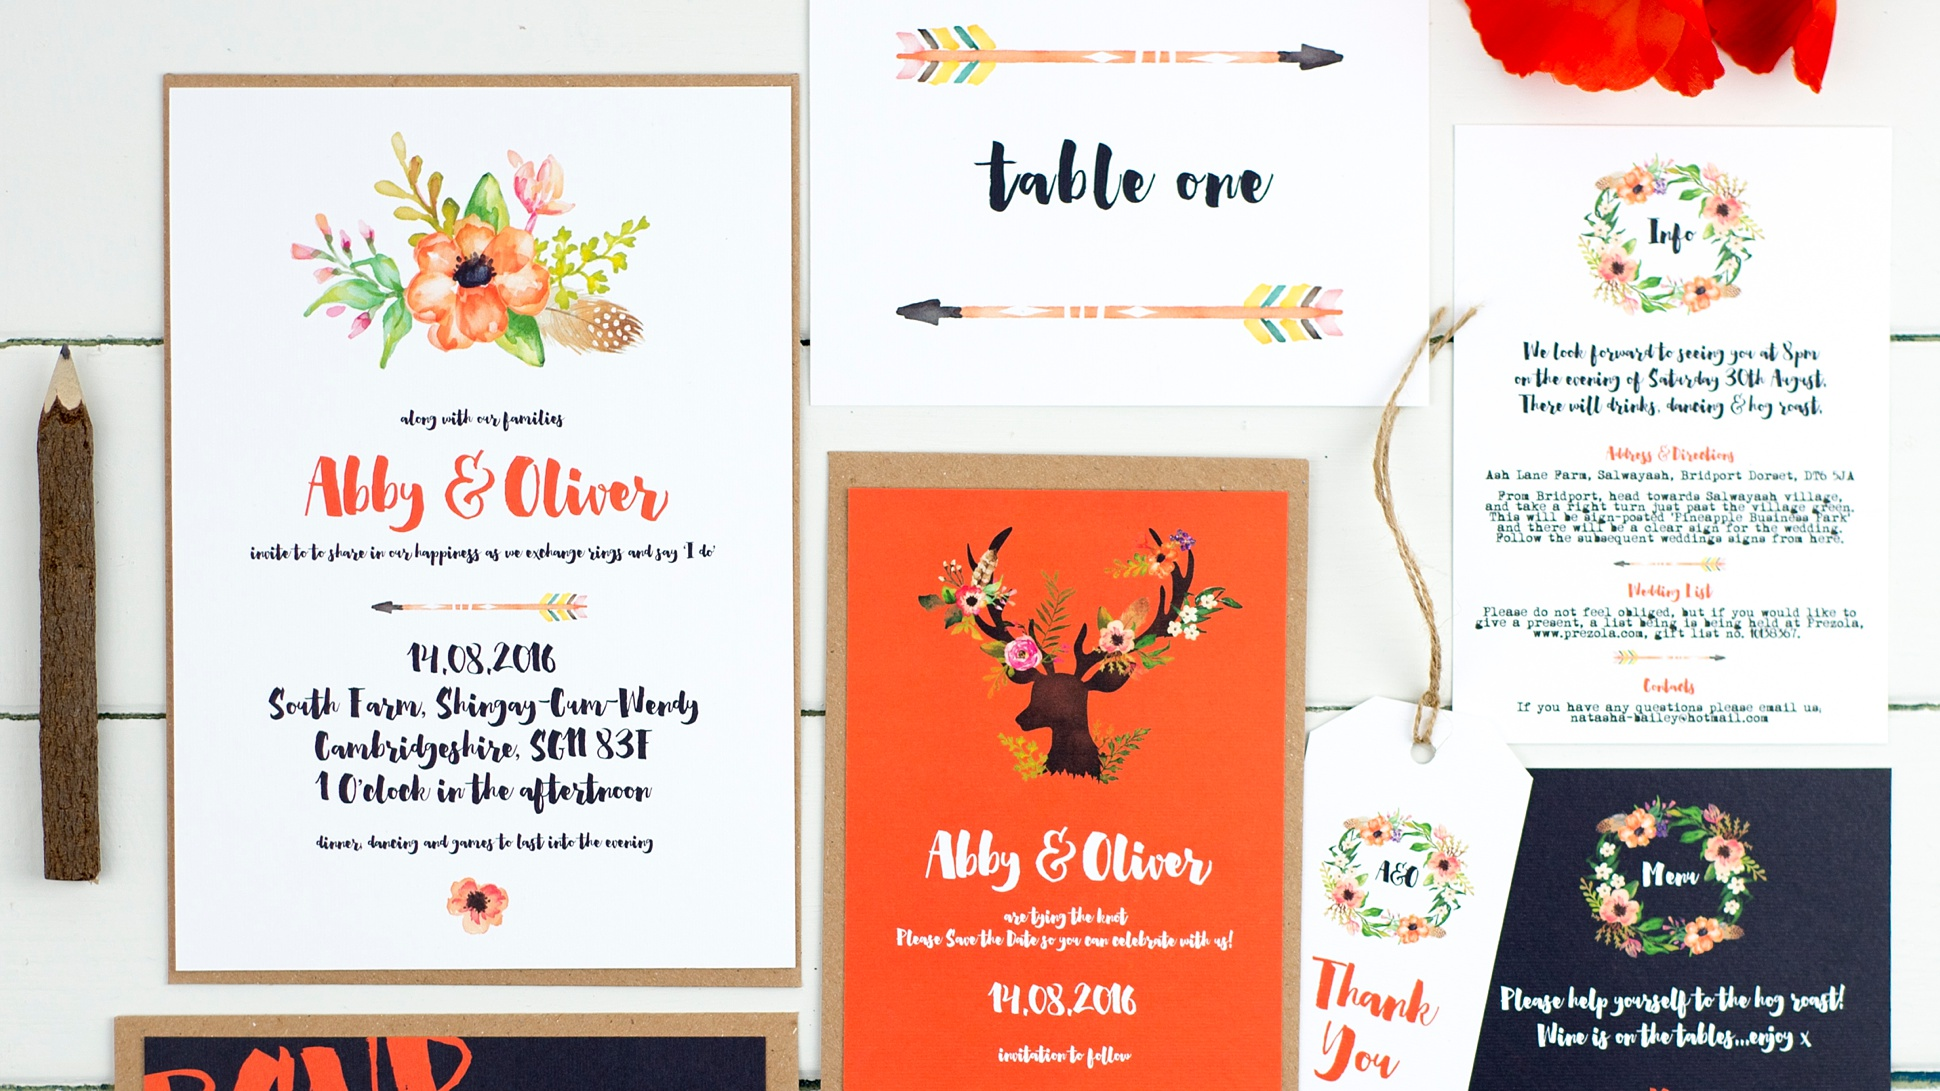 Russet & Gray - Stylish Wedding Stationery & Paper Goods | Mr & Mrs ...